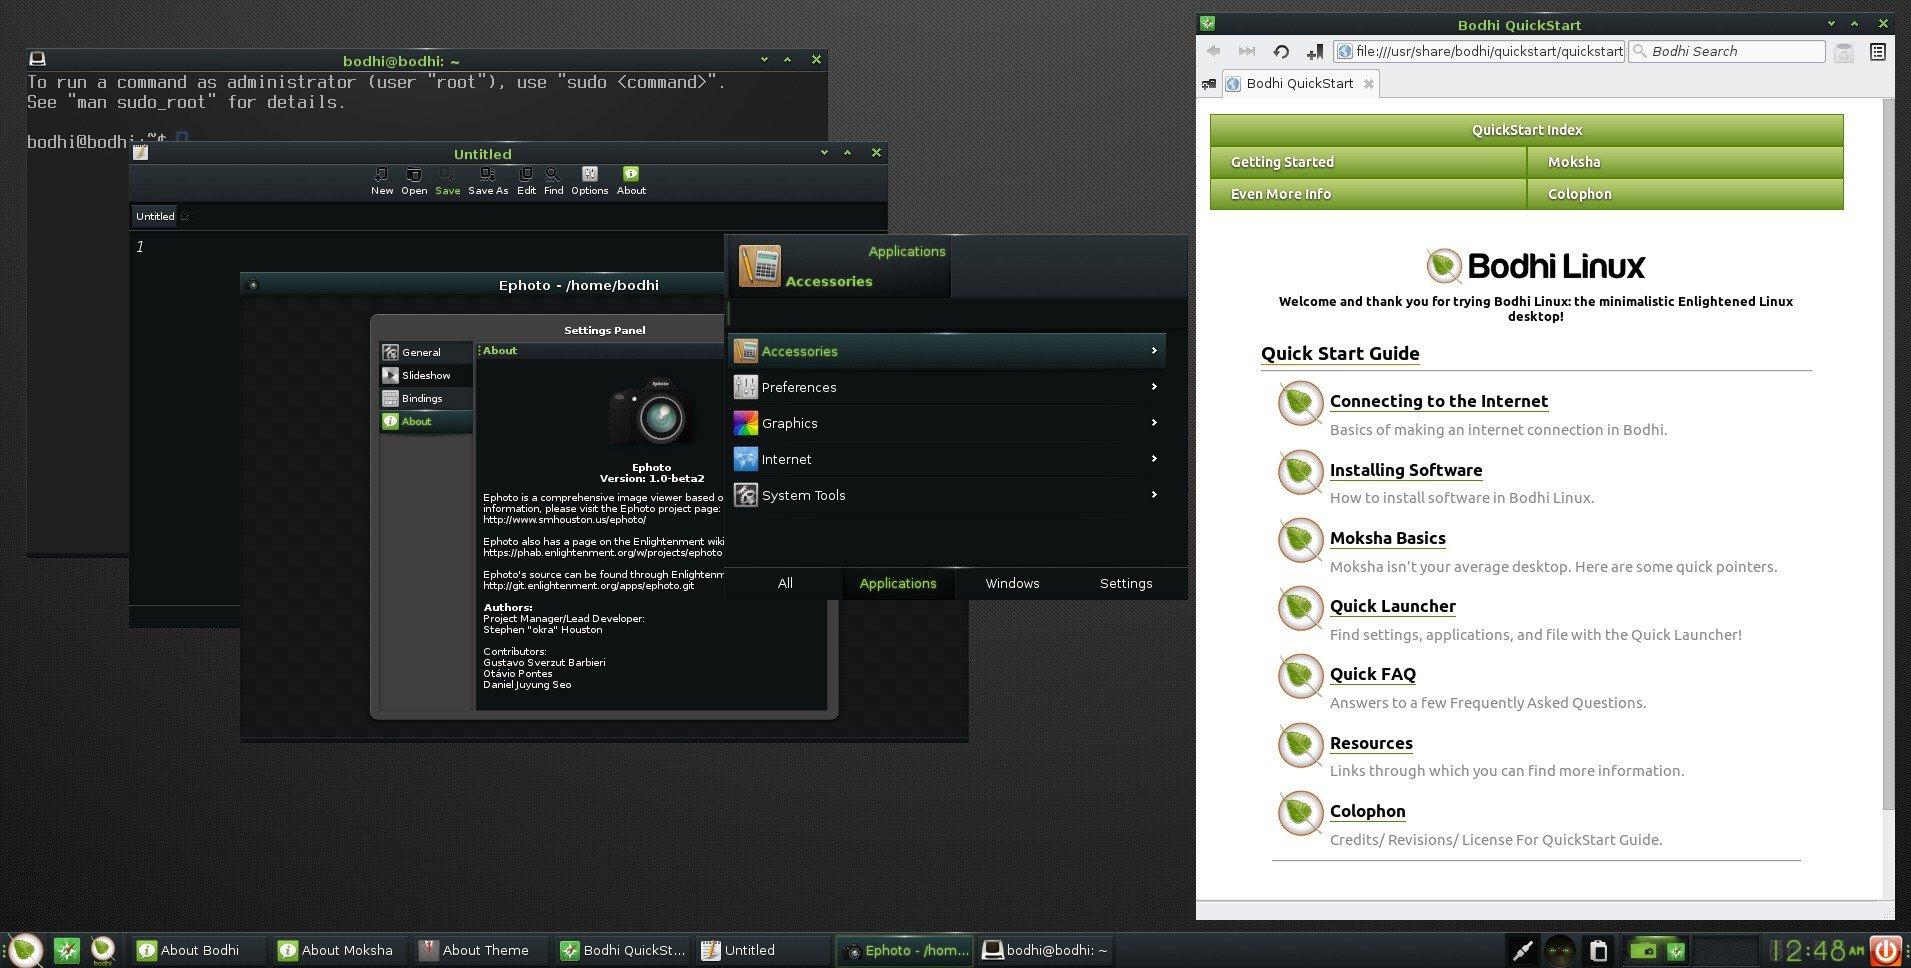 bodhi linux 4.0.0